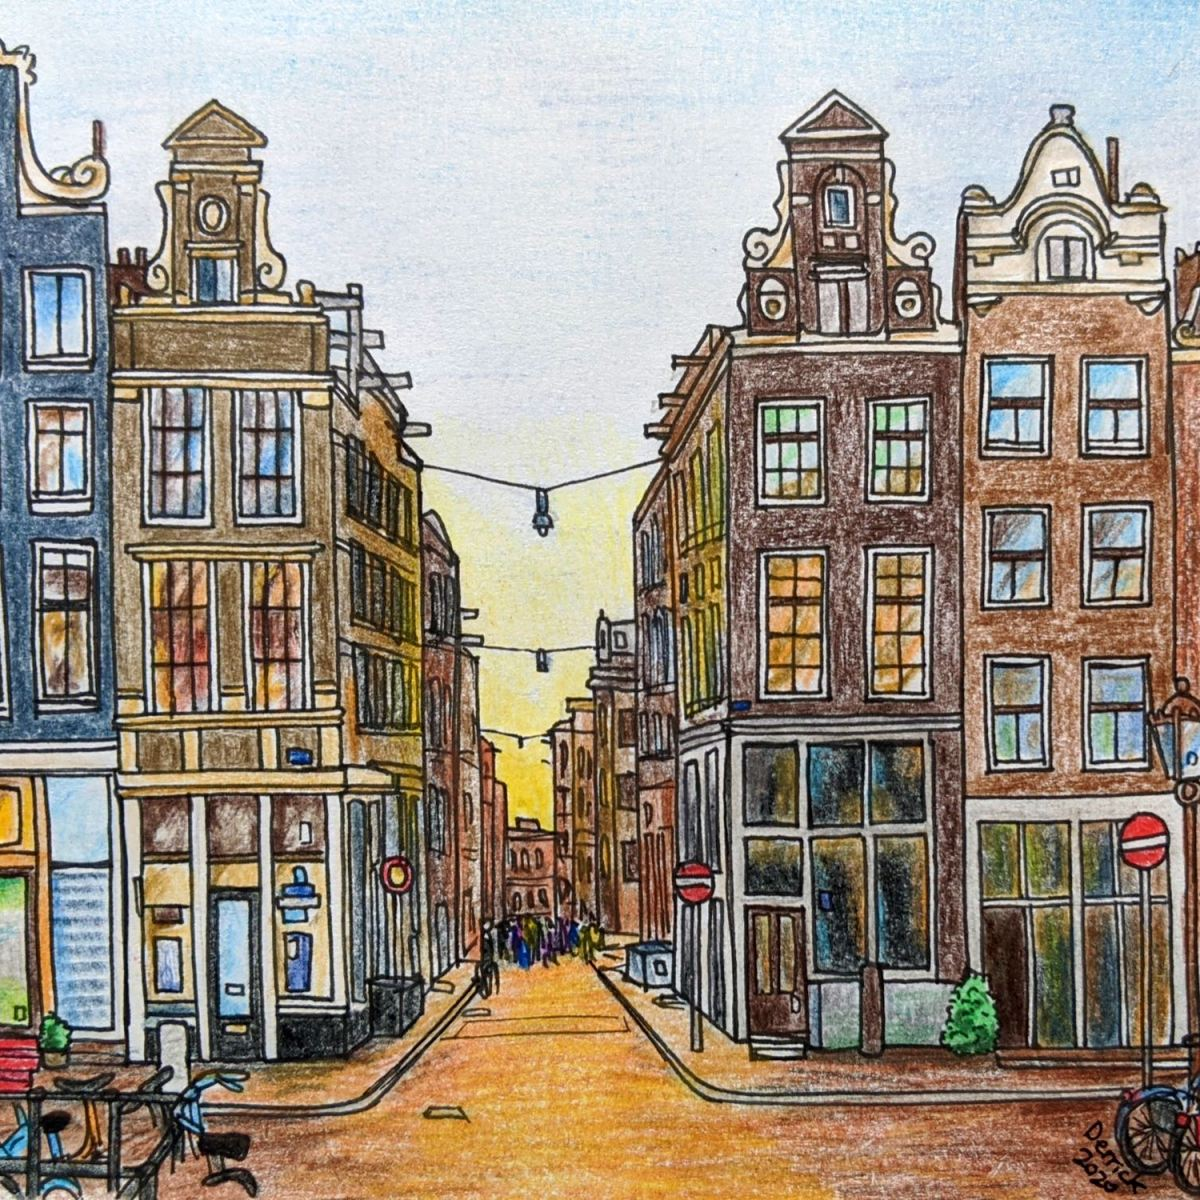 Landscape art Amsterdam nine streets amsterdam buildings at sunset